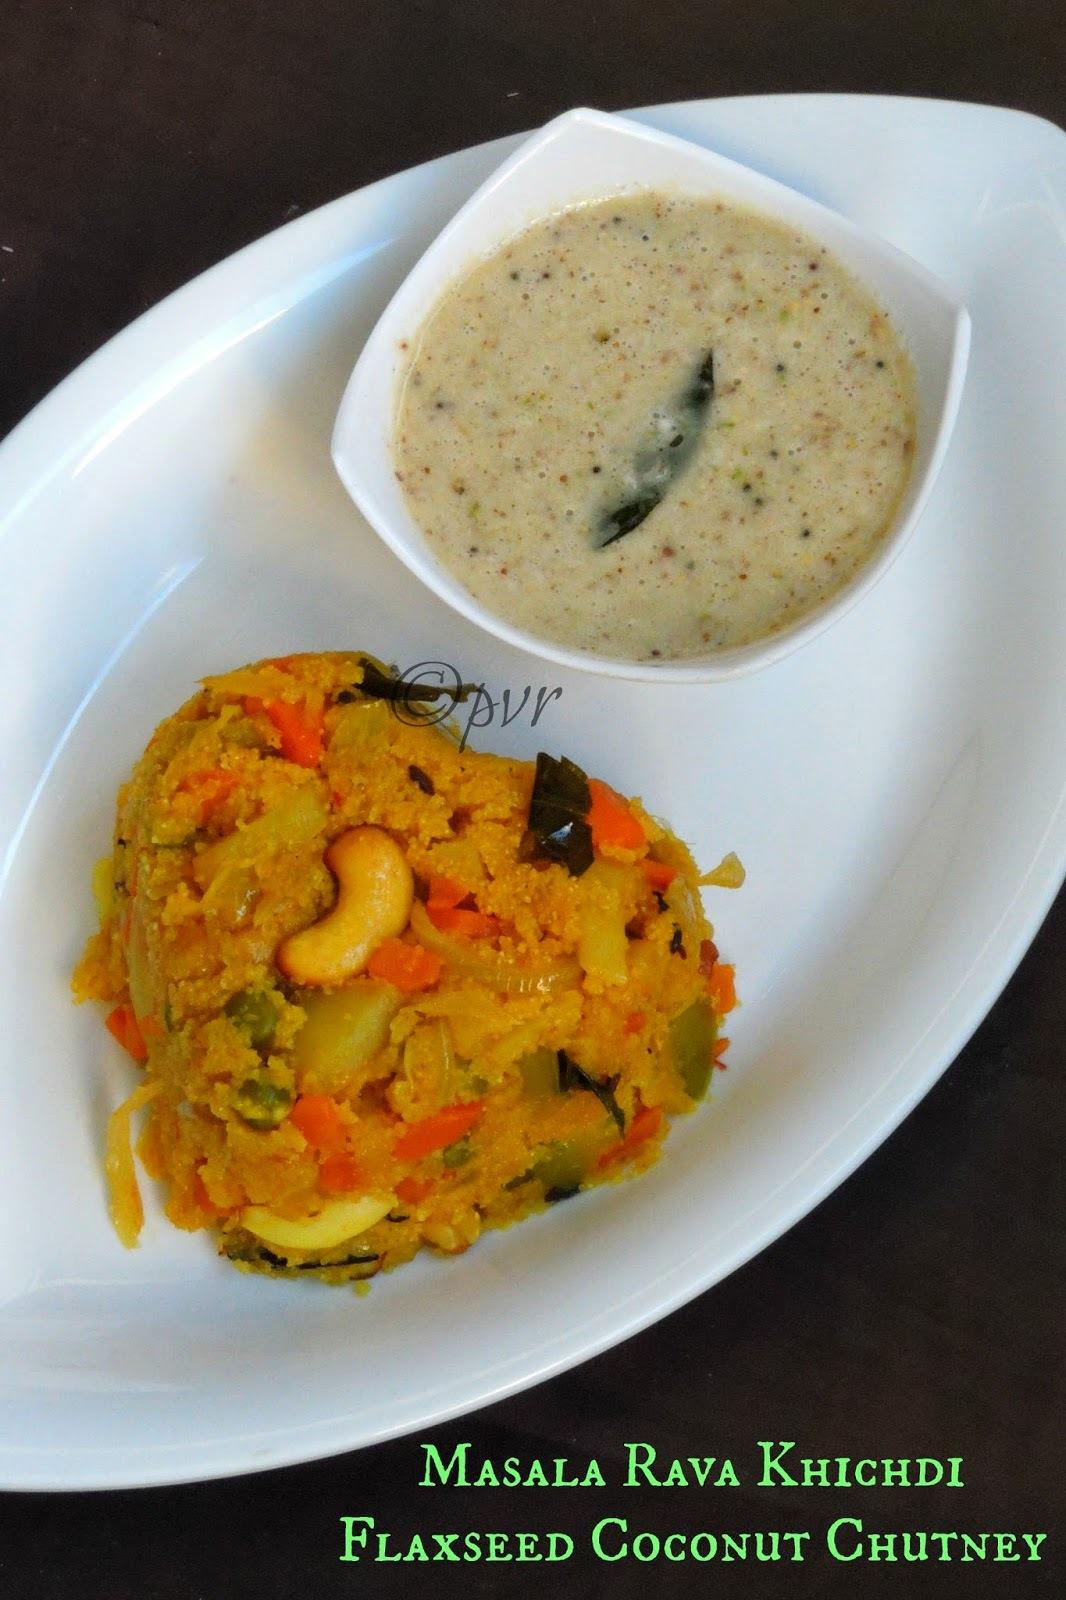 Masala Rava Khichdi & Flaxseed Coconut Chutney